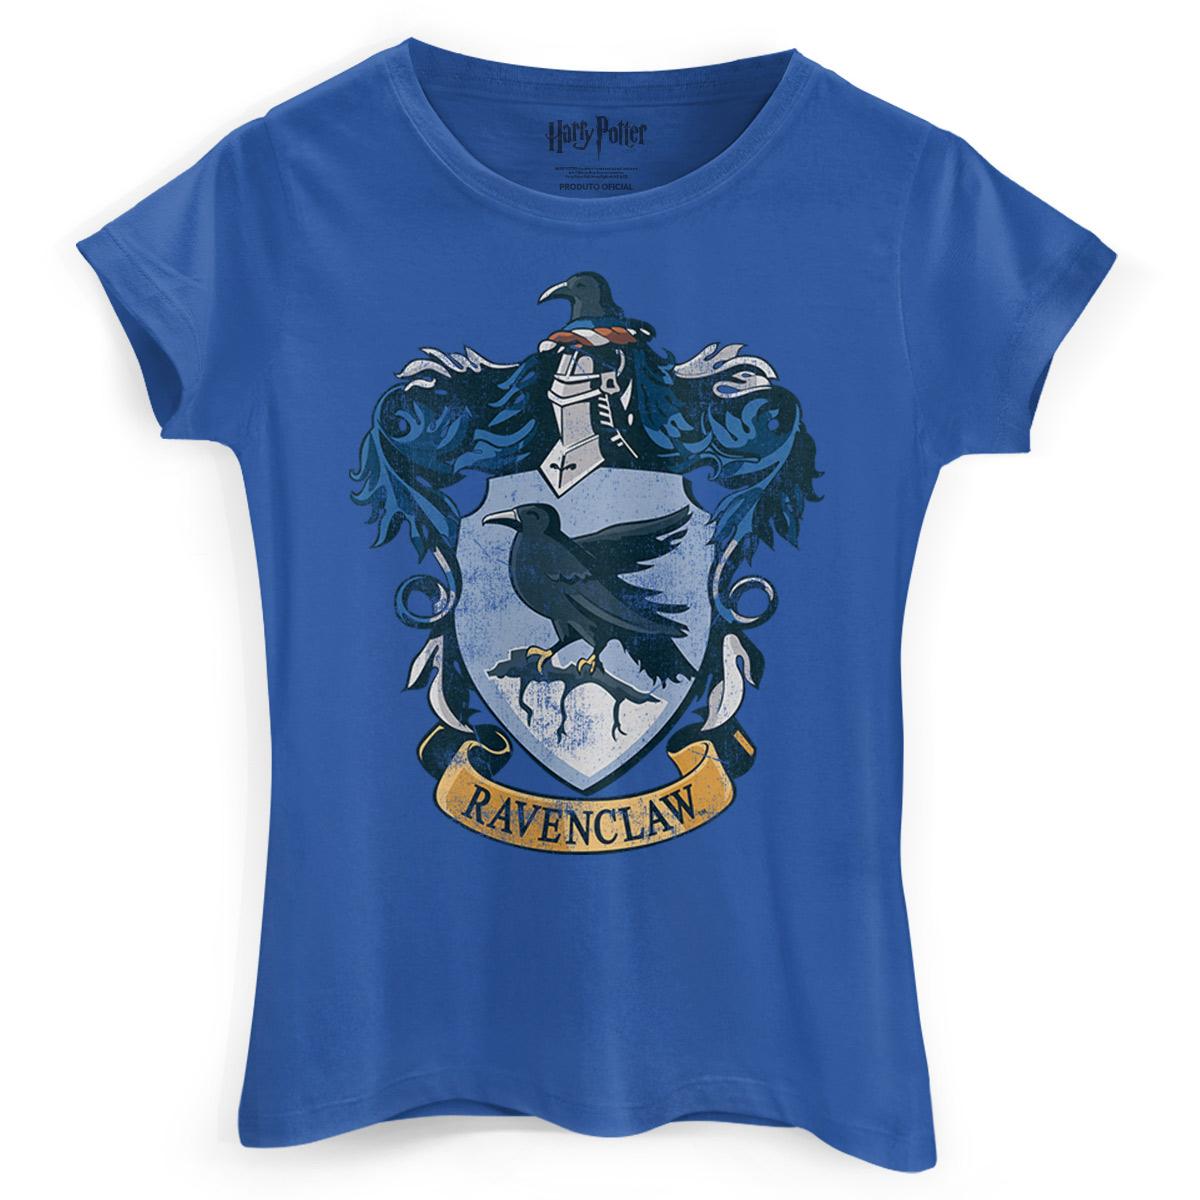 Camiseta Feminina Harry Potter Ravenclaw